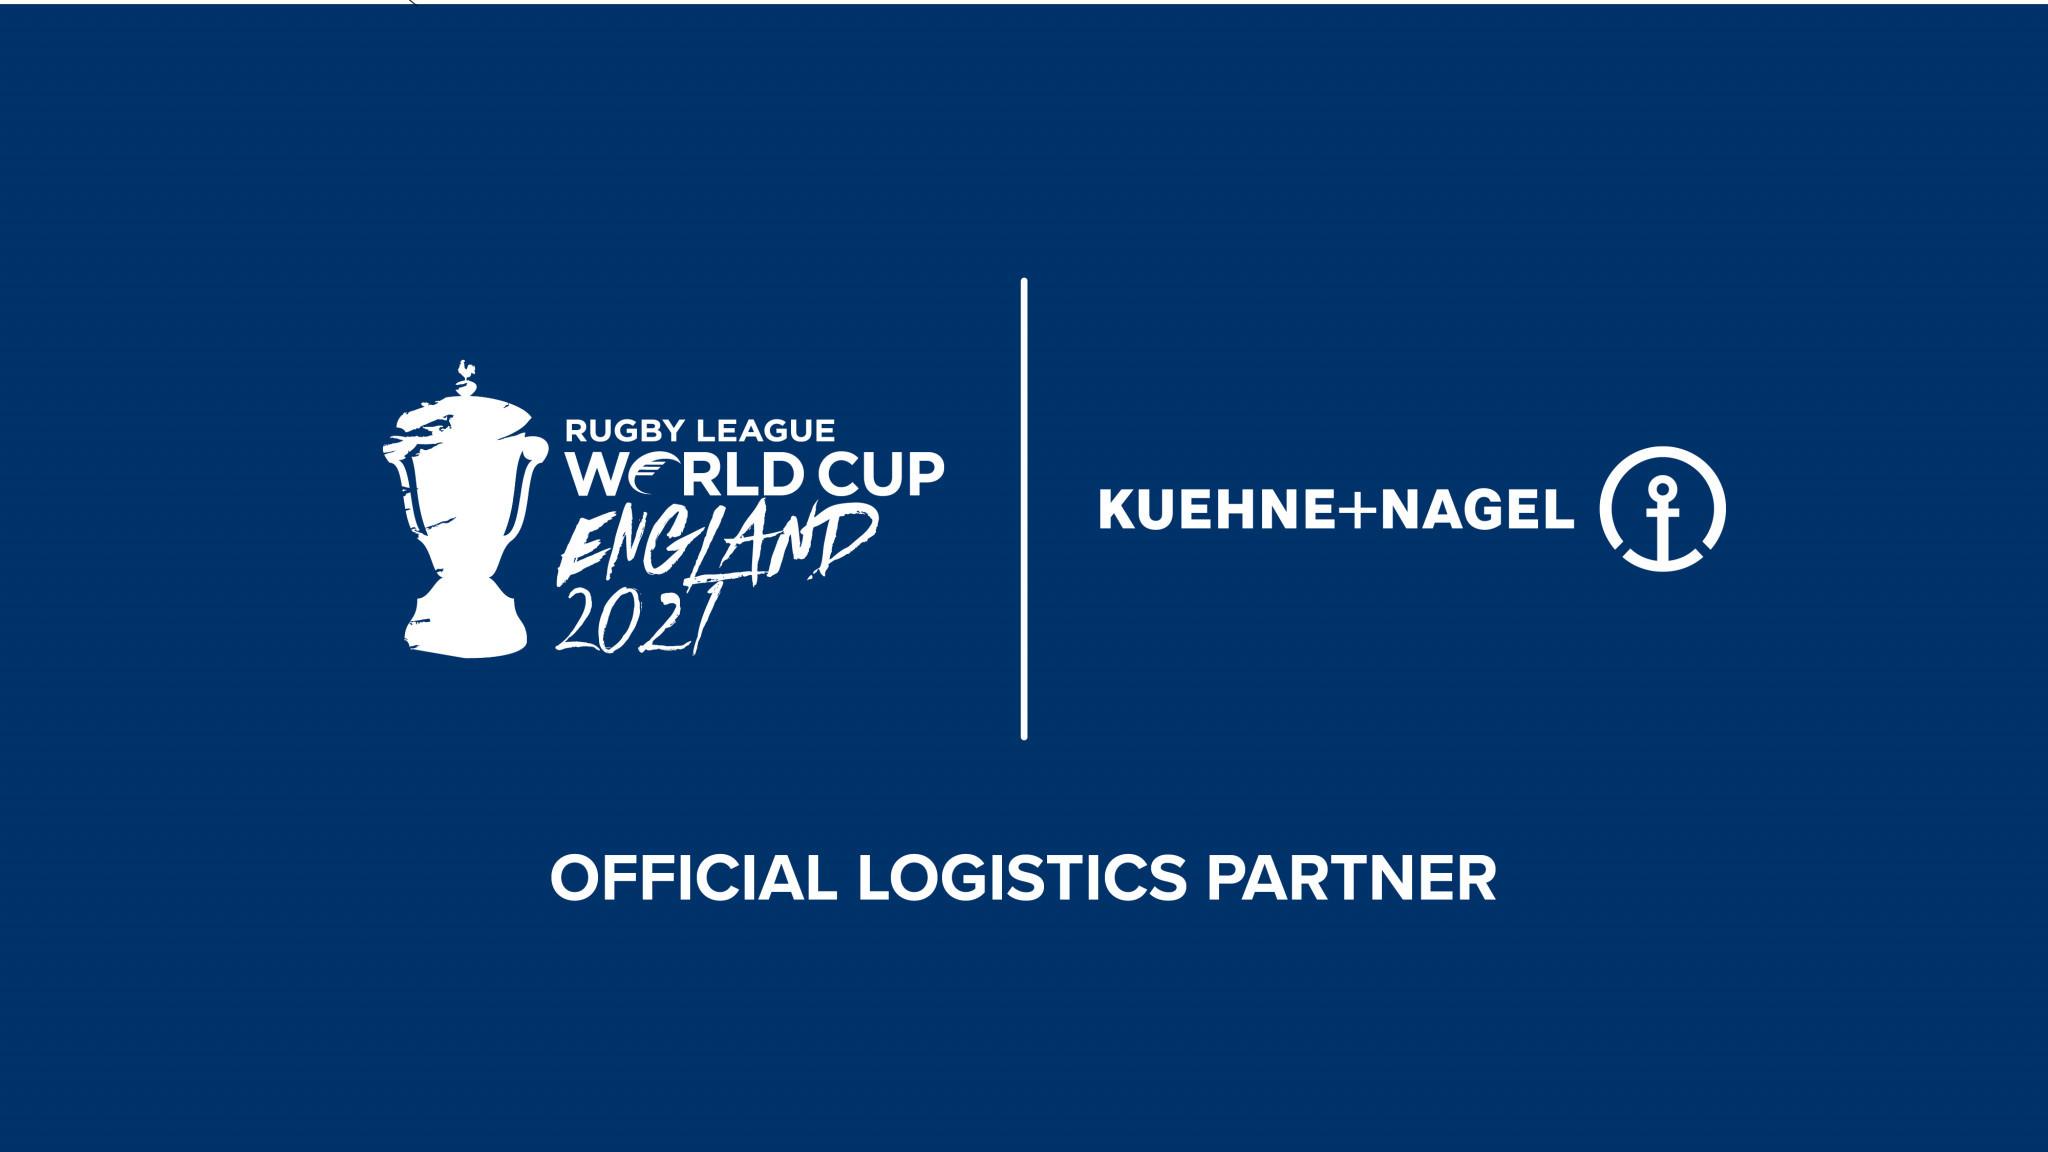 Rugby League World Cup 2021 announces Kuehne+Nagel as official logistics partner